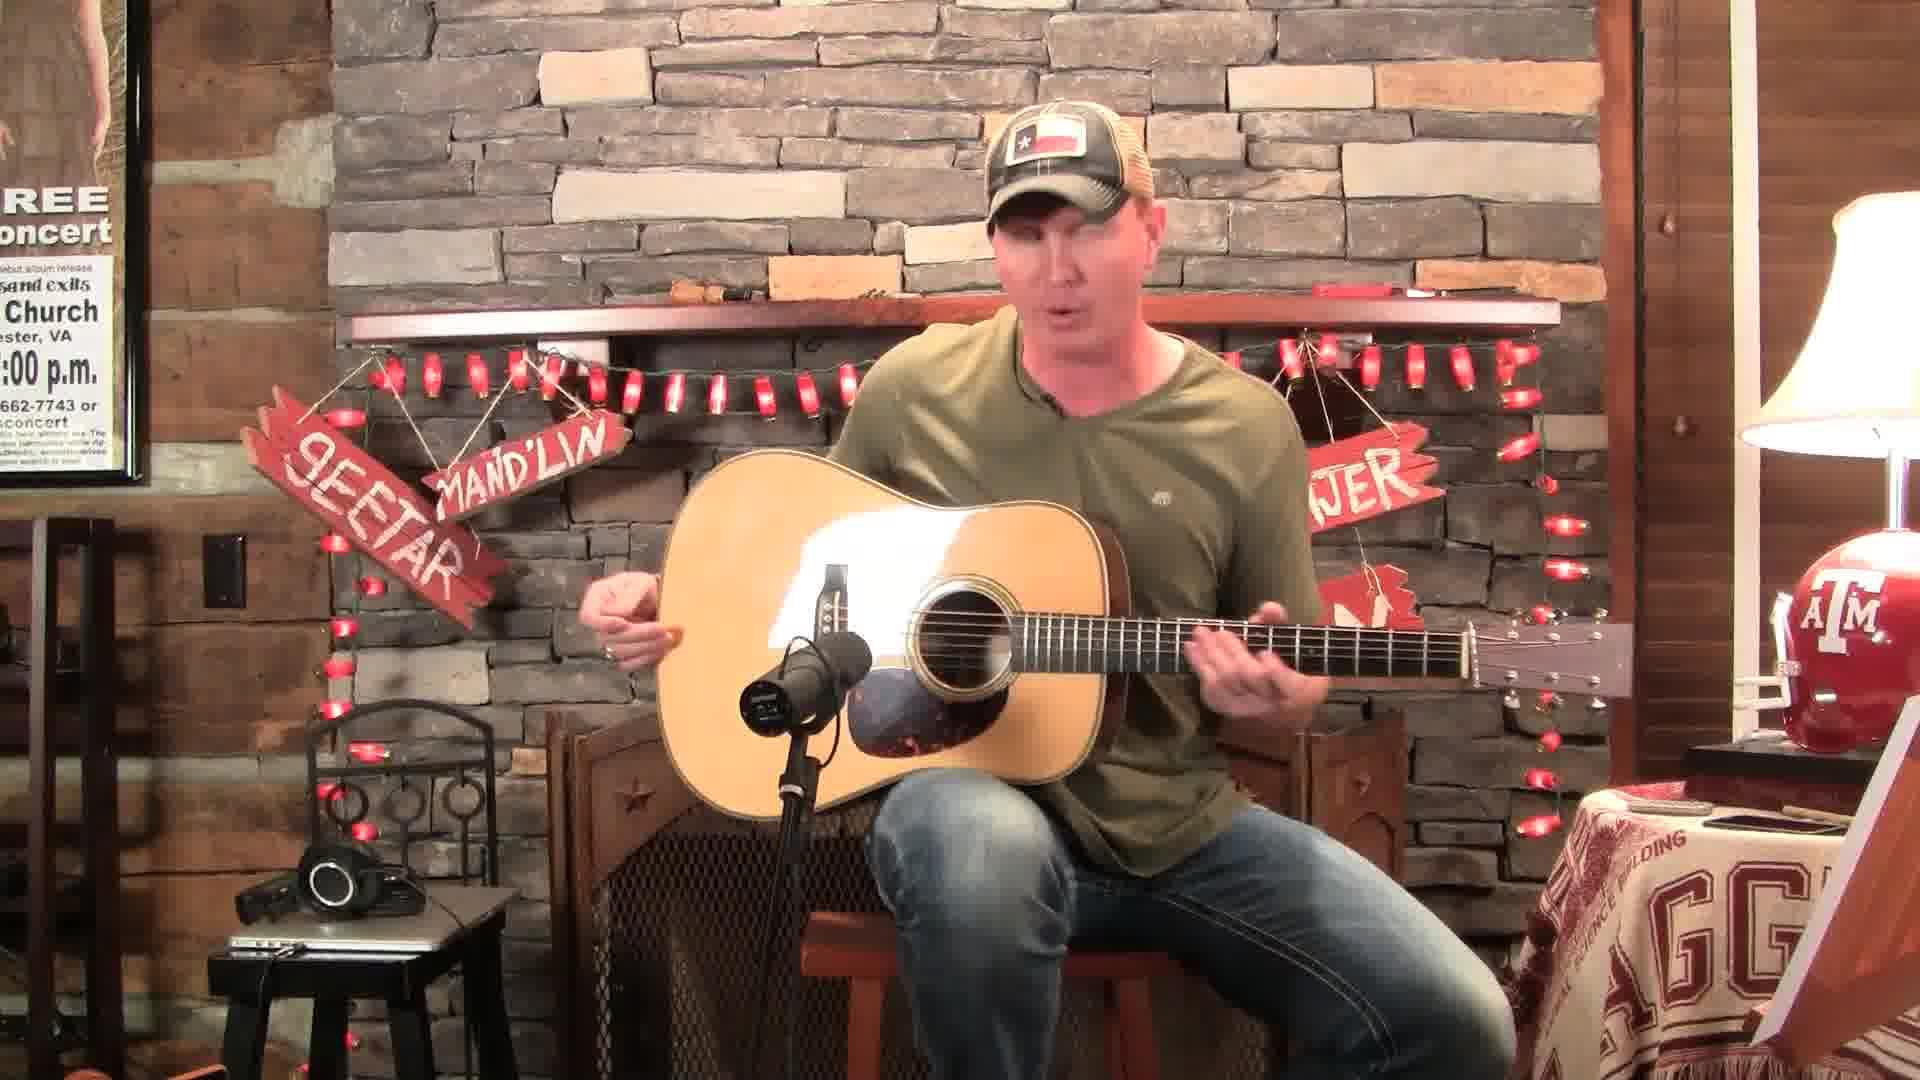 cuckoo's nest guitar solo